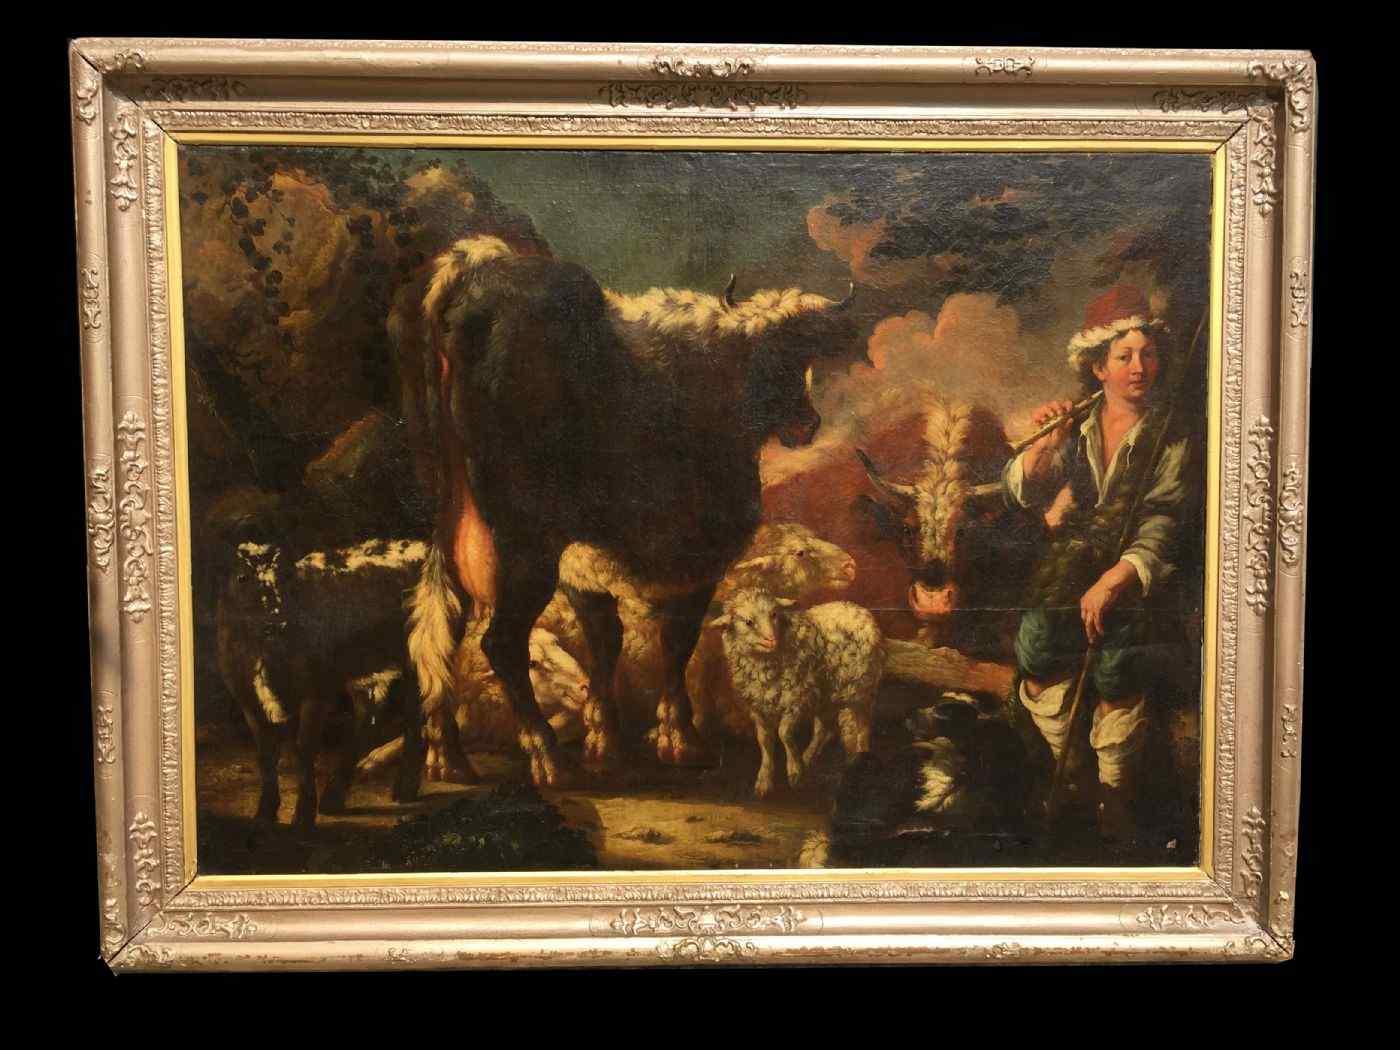 Grande Dipinto, olio su tela, del XVII secolo